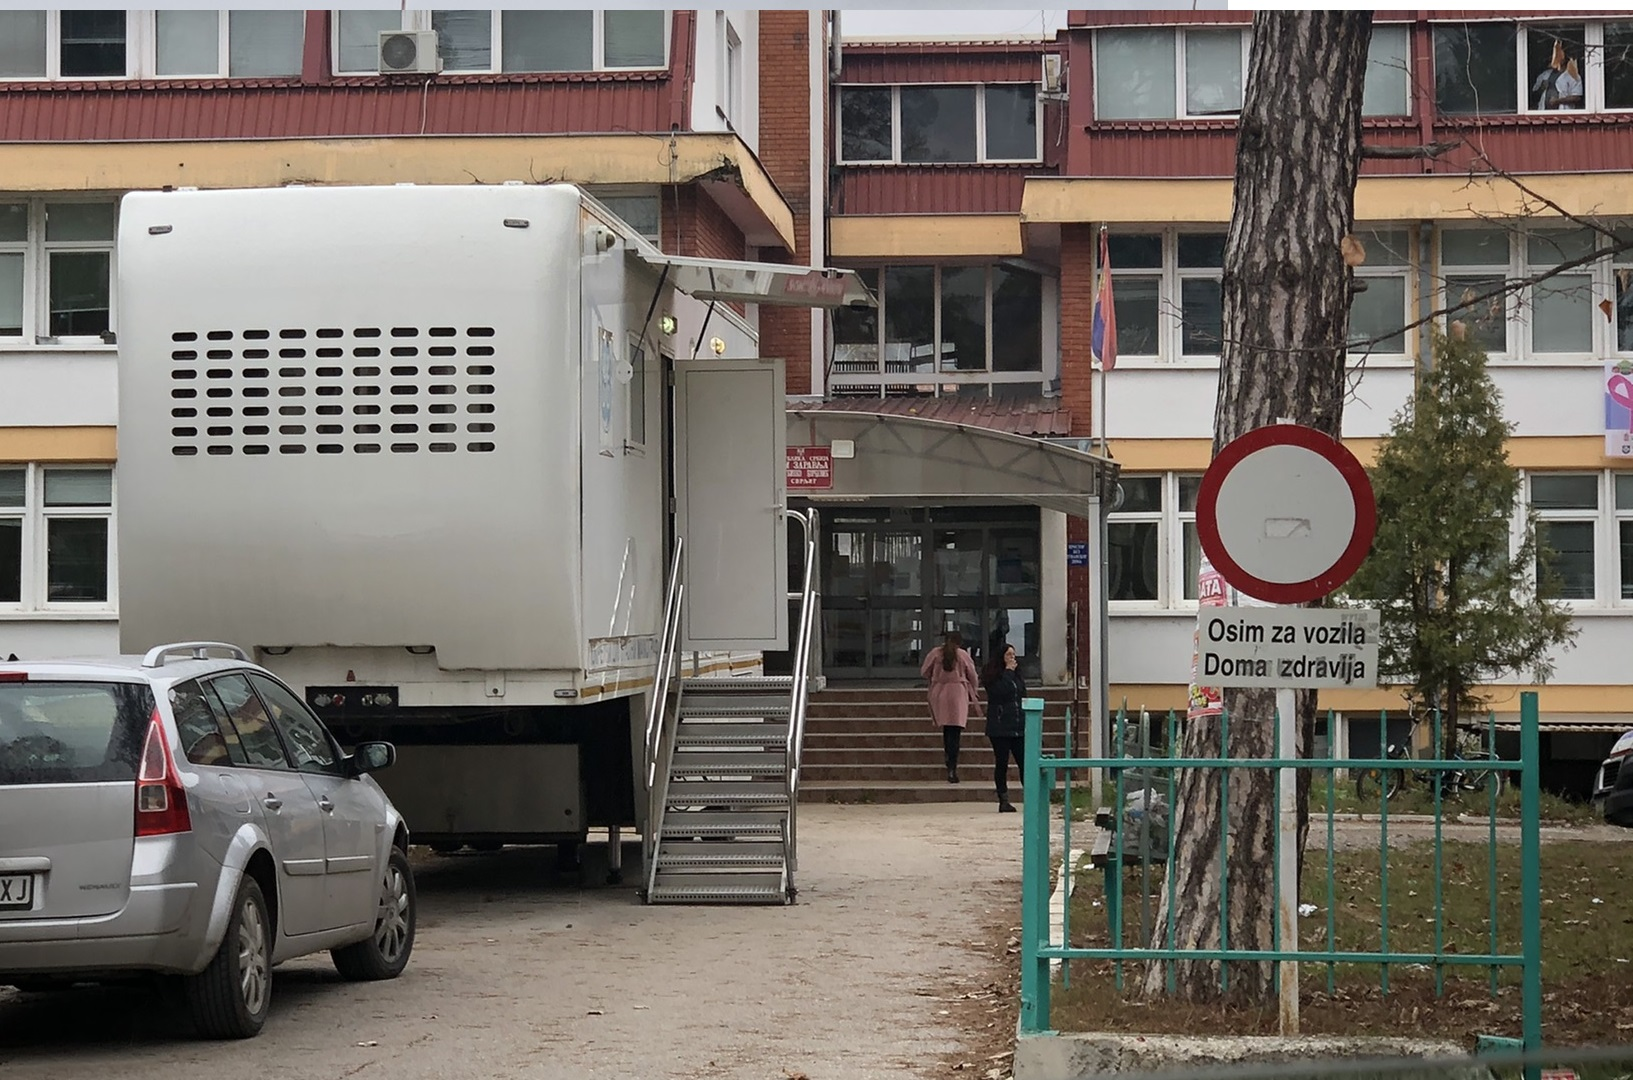 Mamograf u dvorištu, foto: M.M.